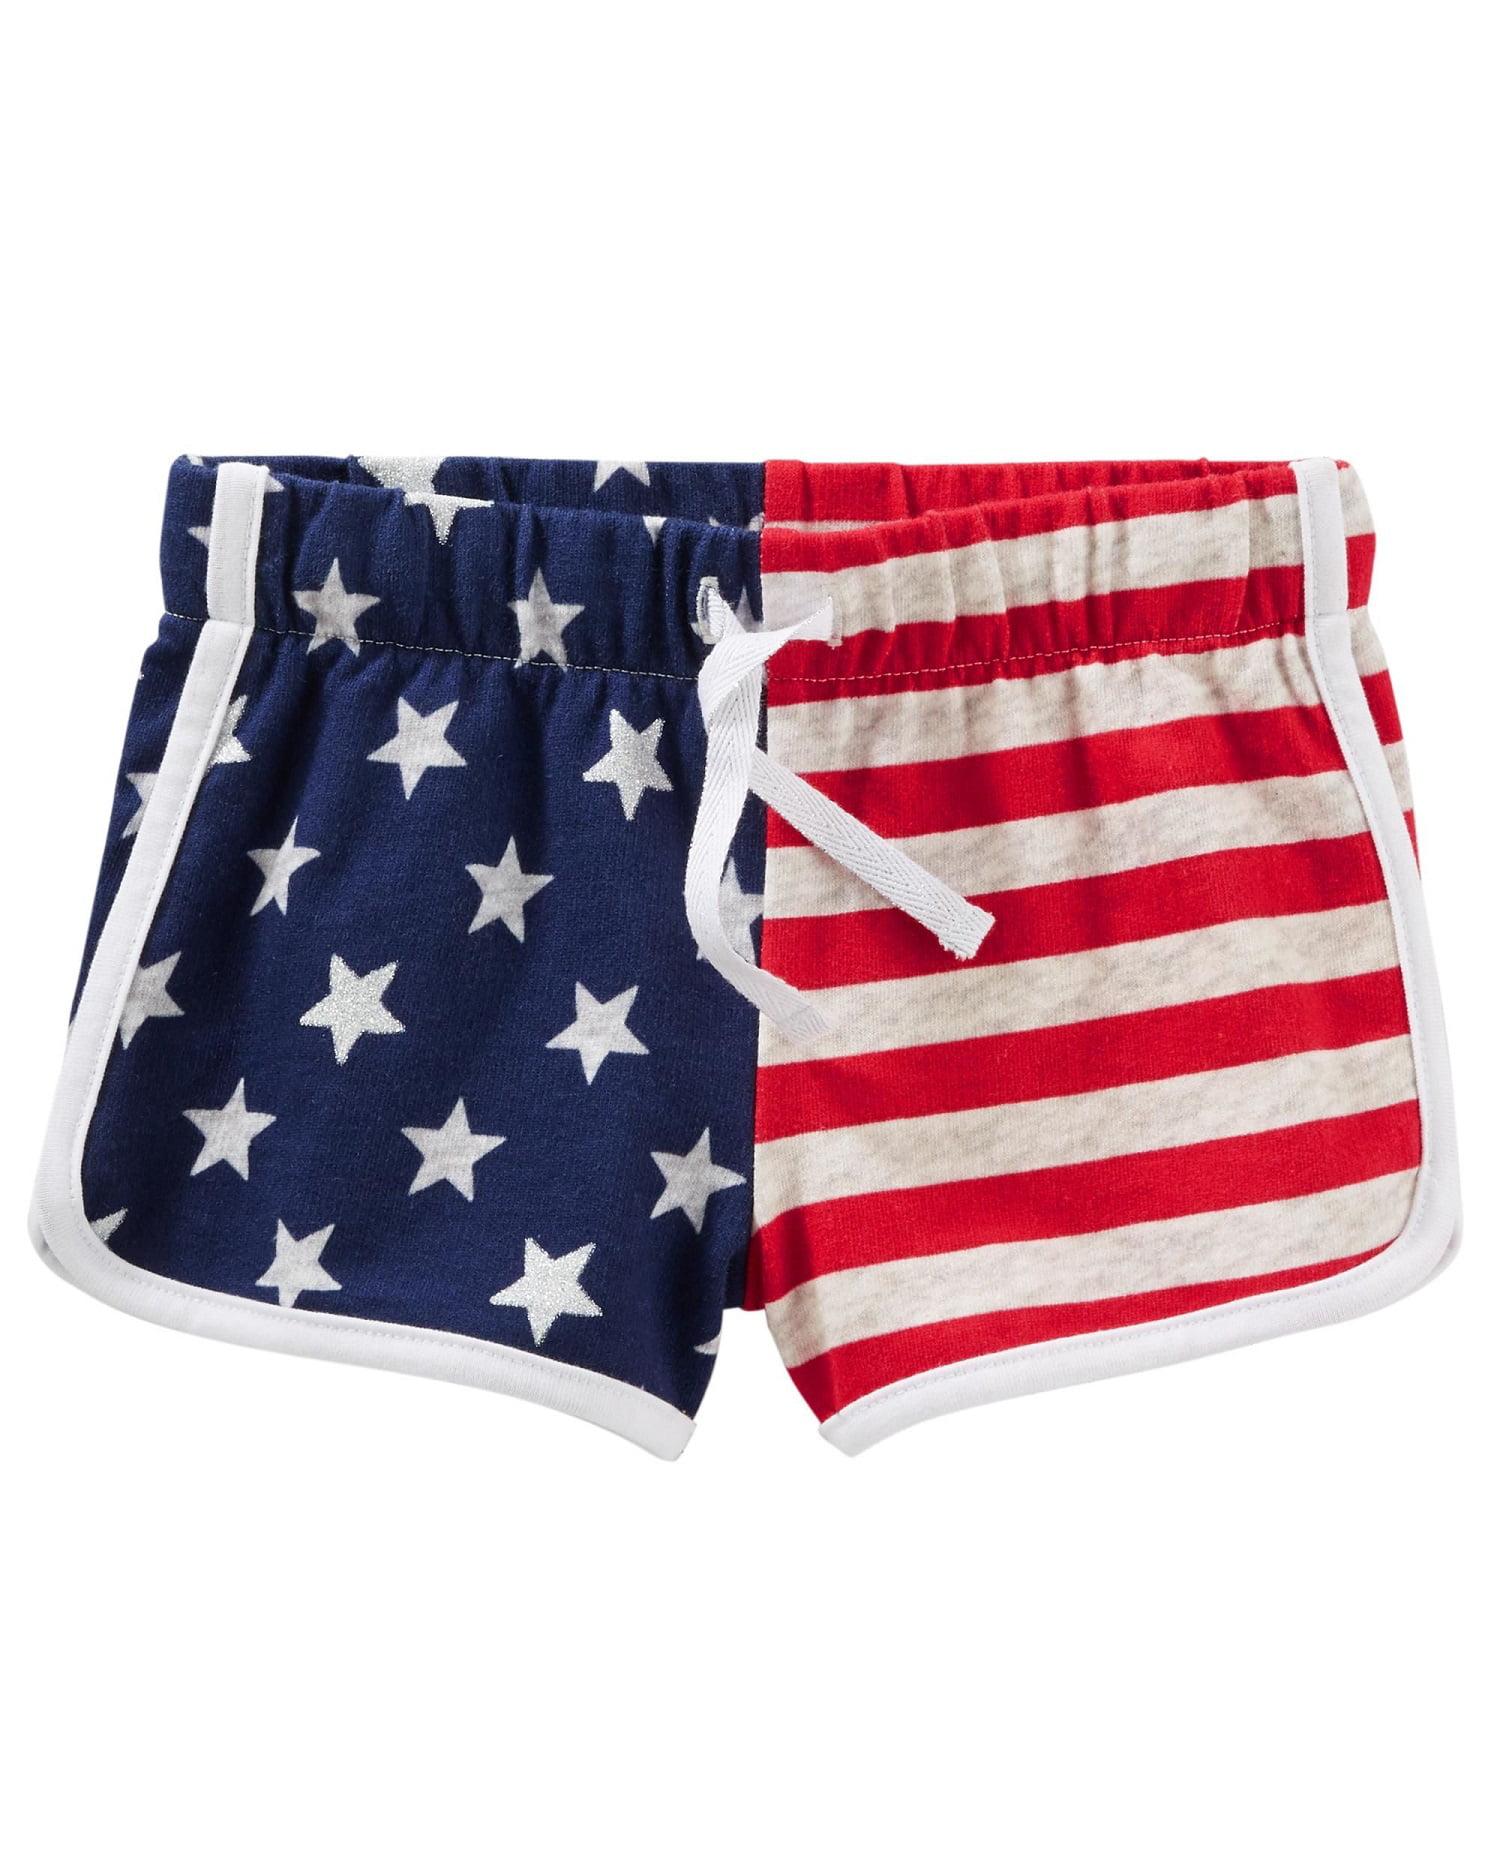 OshKosh B'gosh Big Girls' Americana Pull-On Shorts, 7 Kids